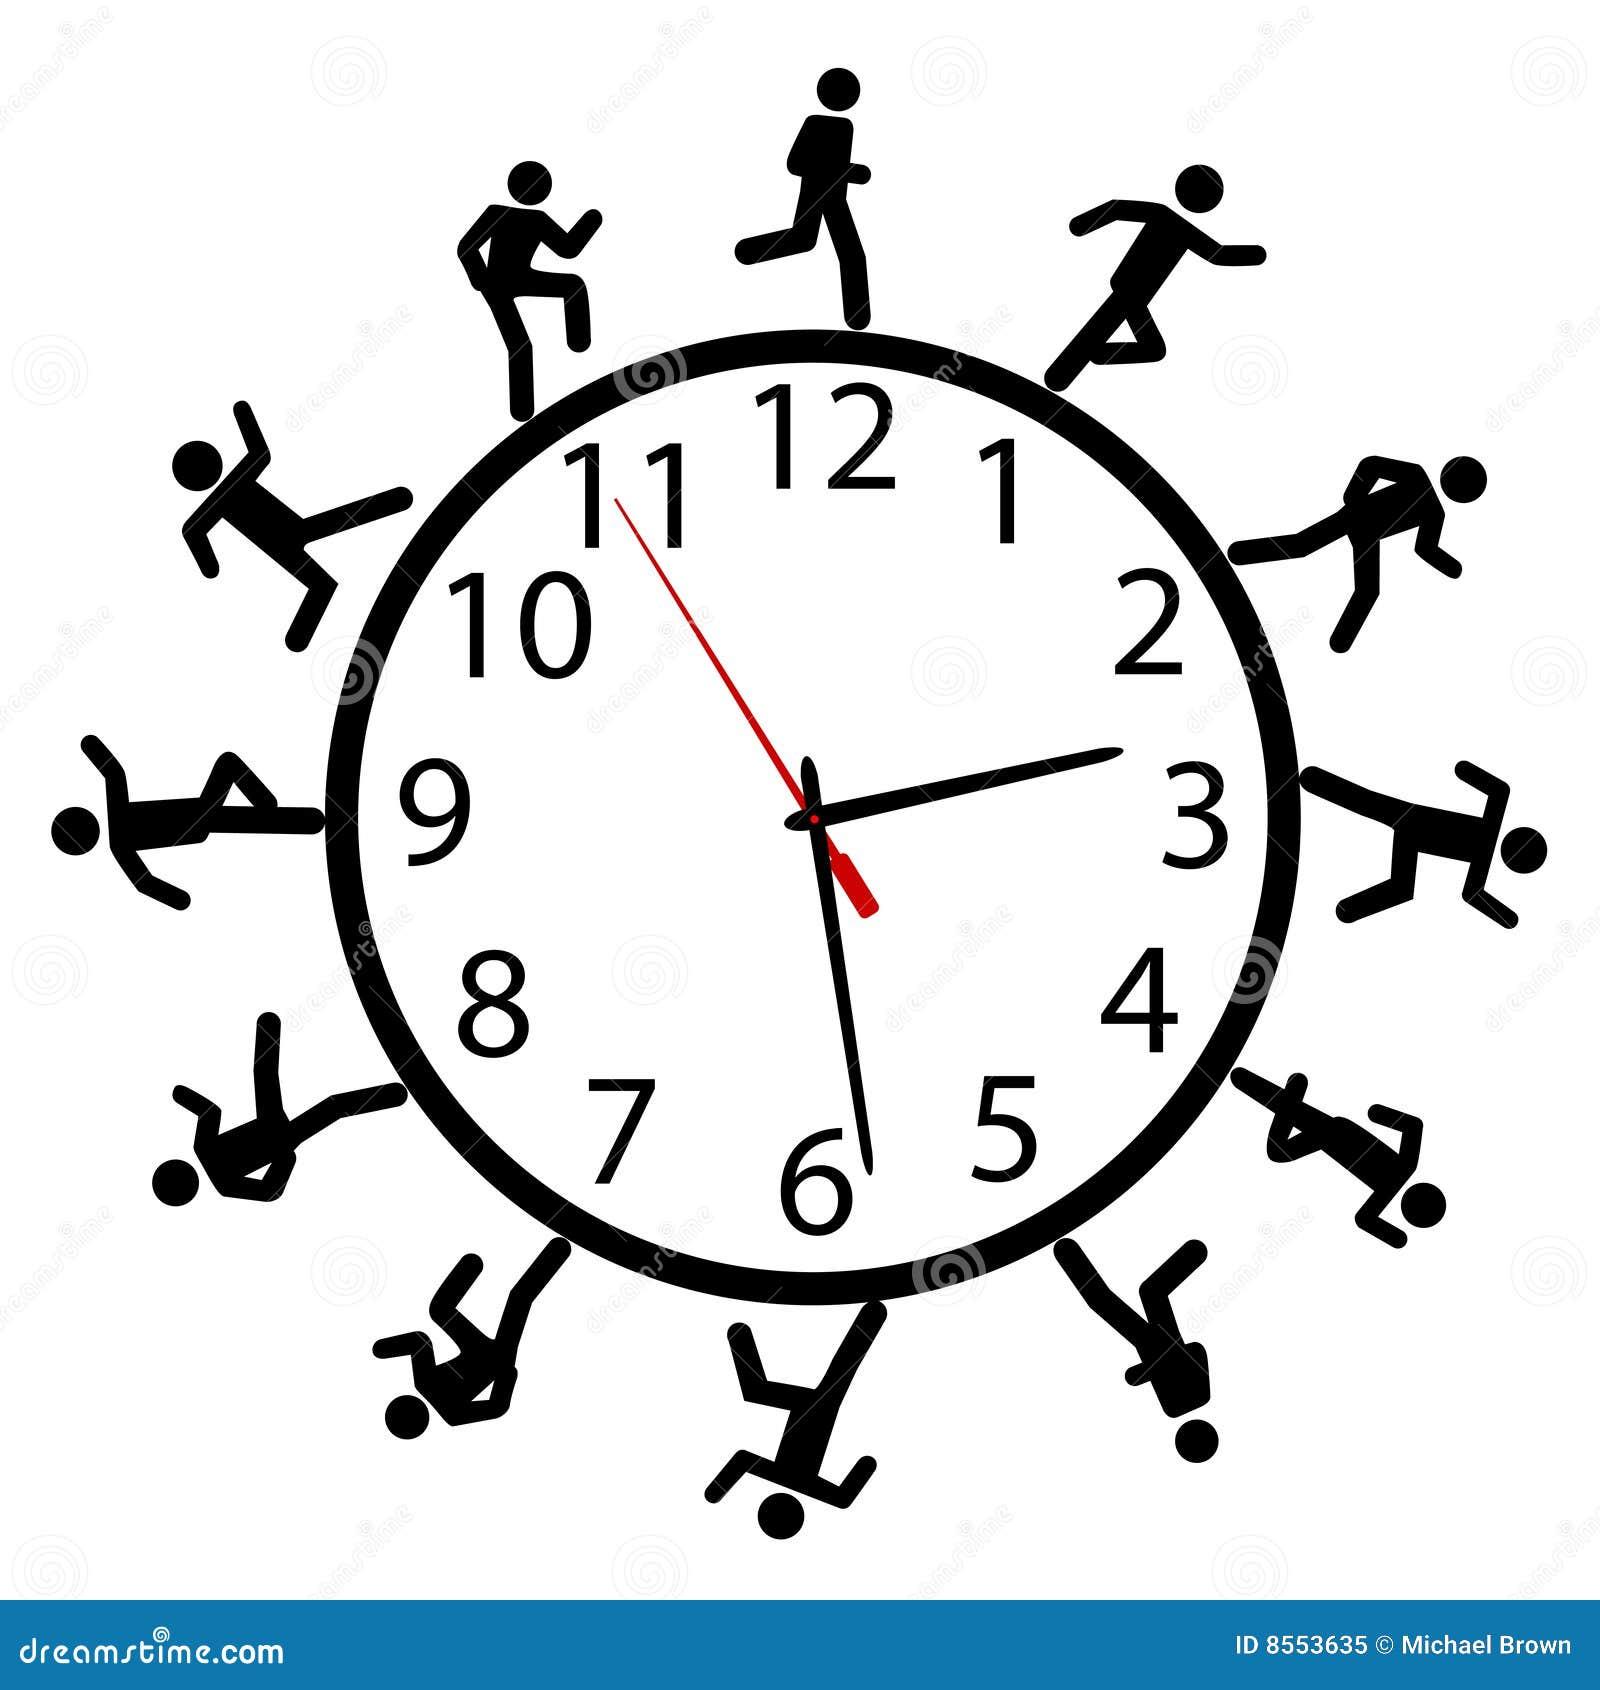 racing the clock clip art video - photo #5